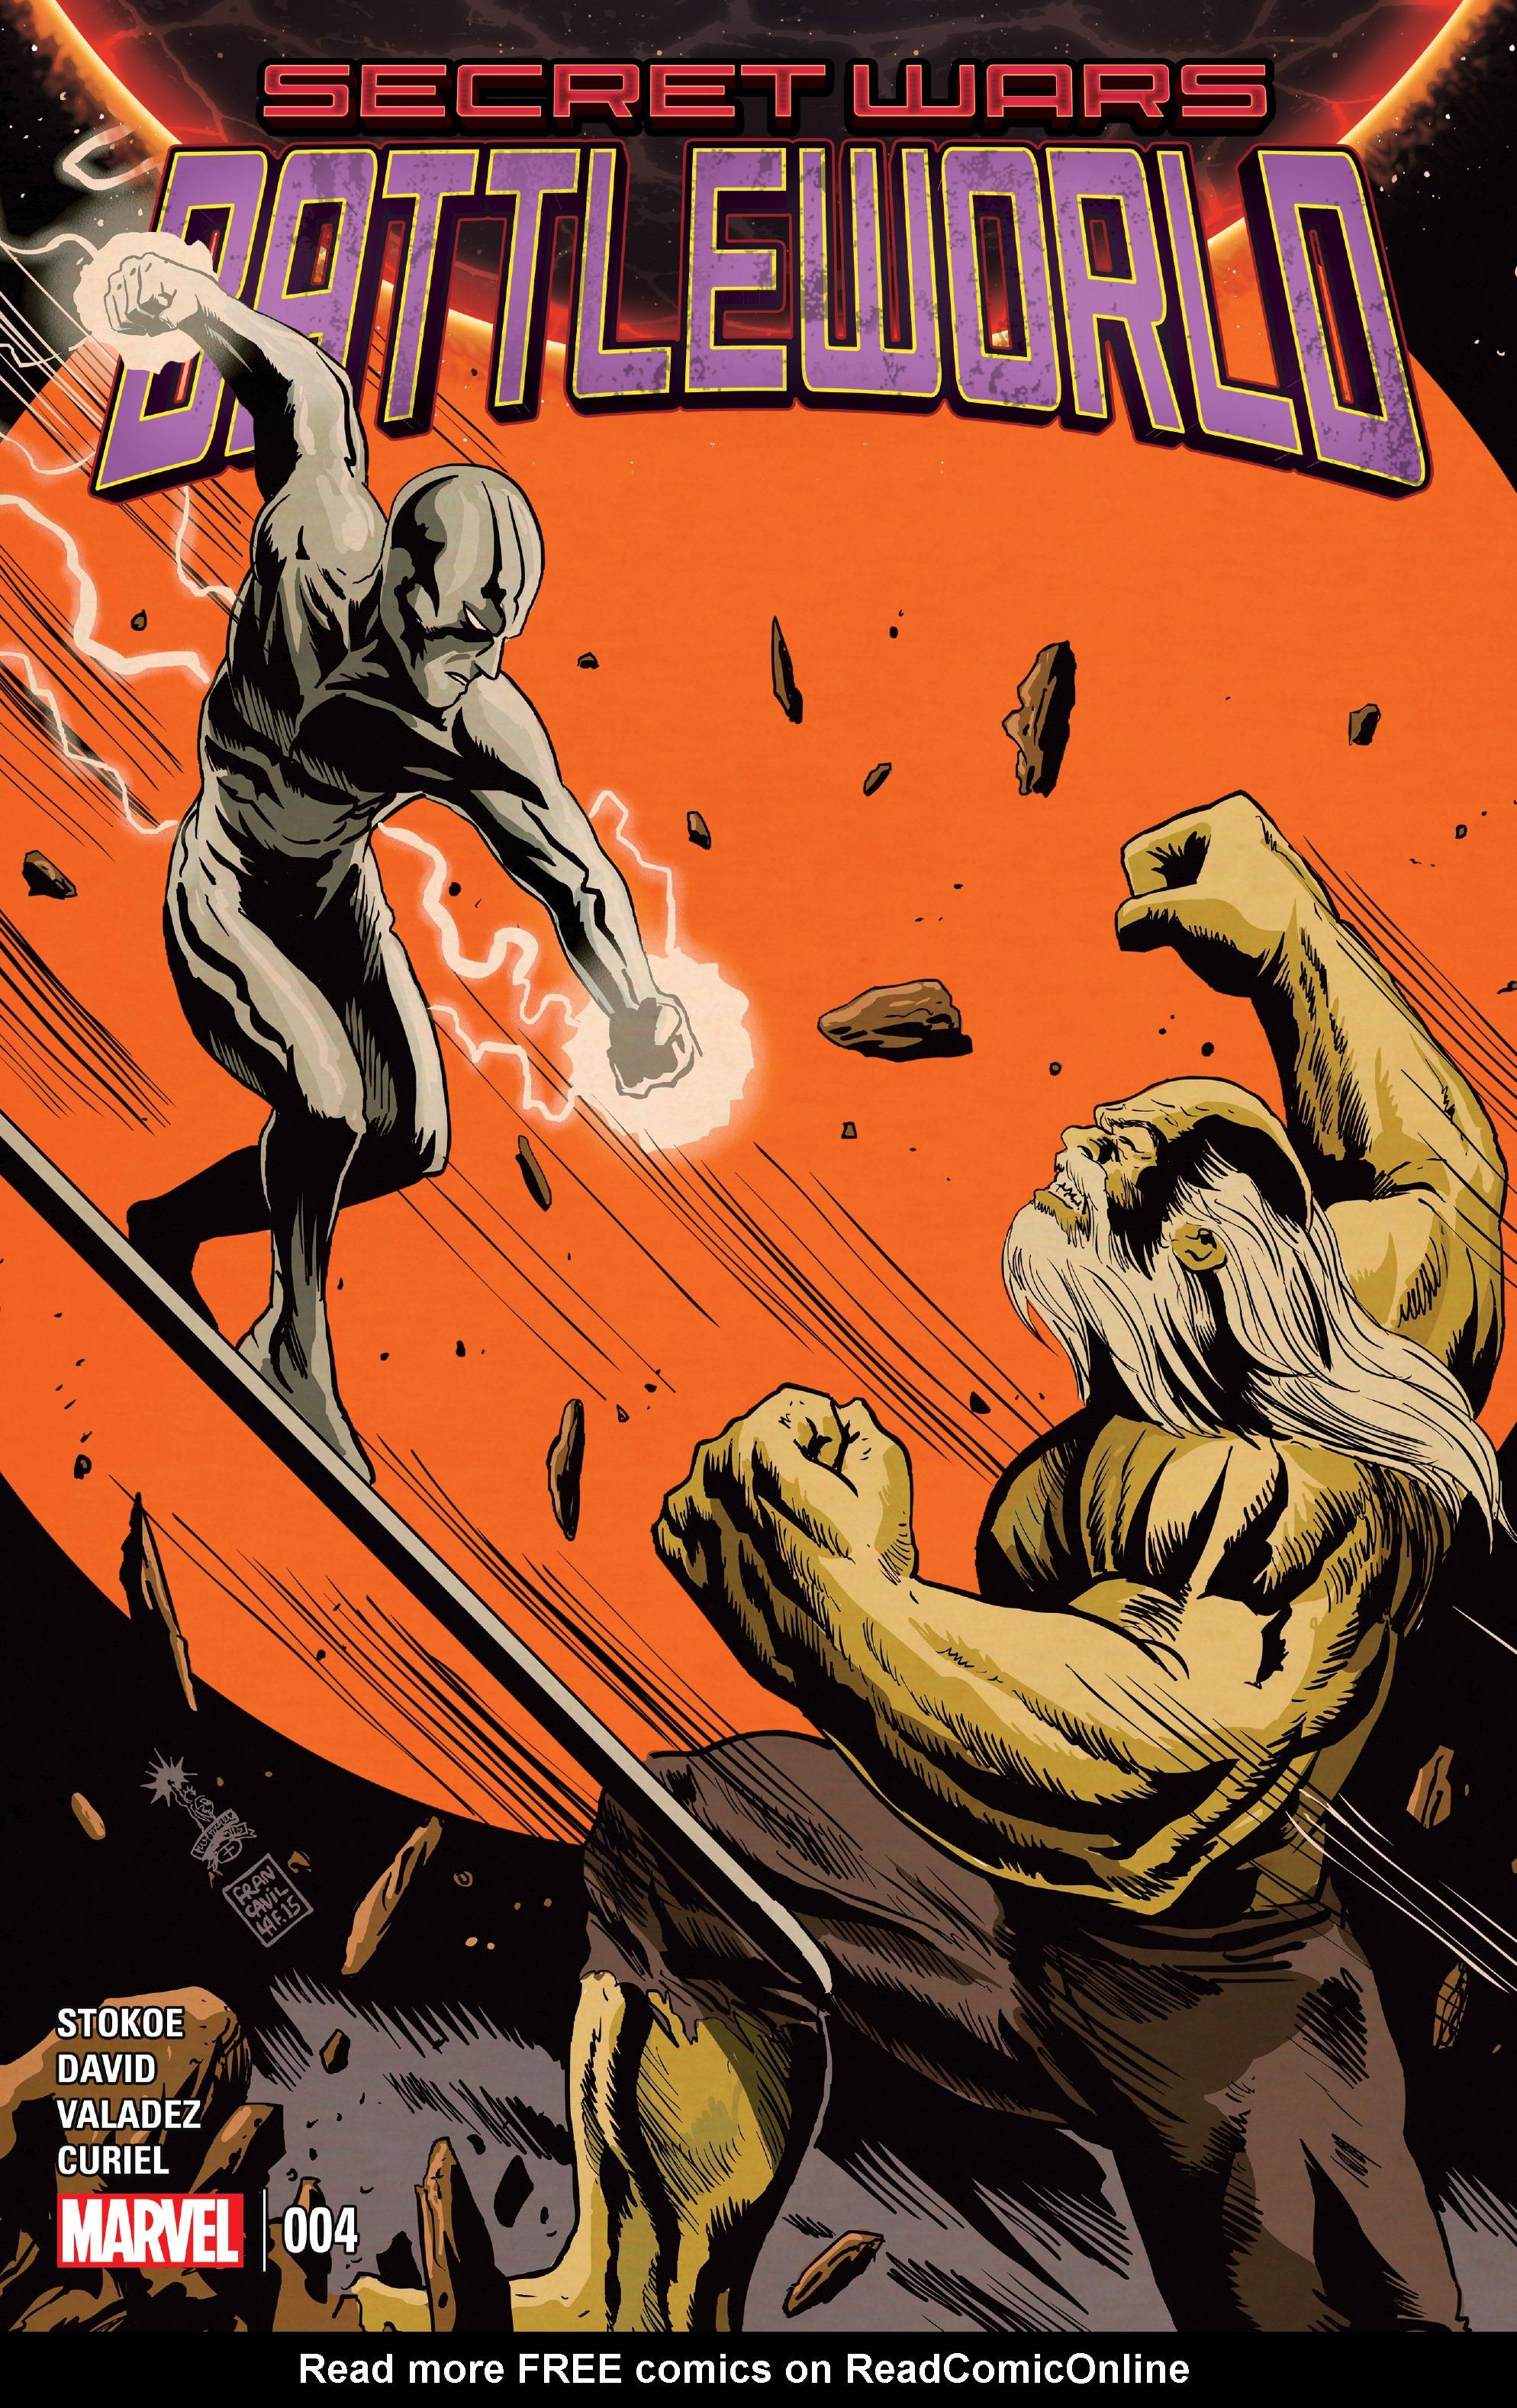 Read online Secret Wars Journal/Battleworld comic -  Issue # TPB - 187